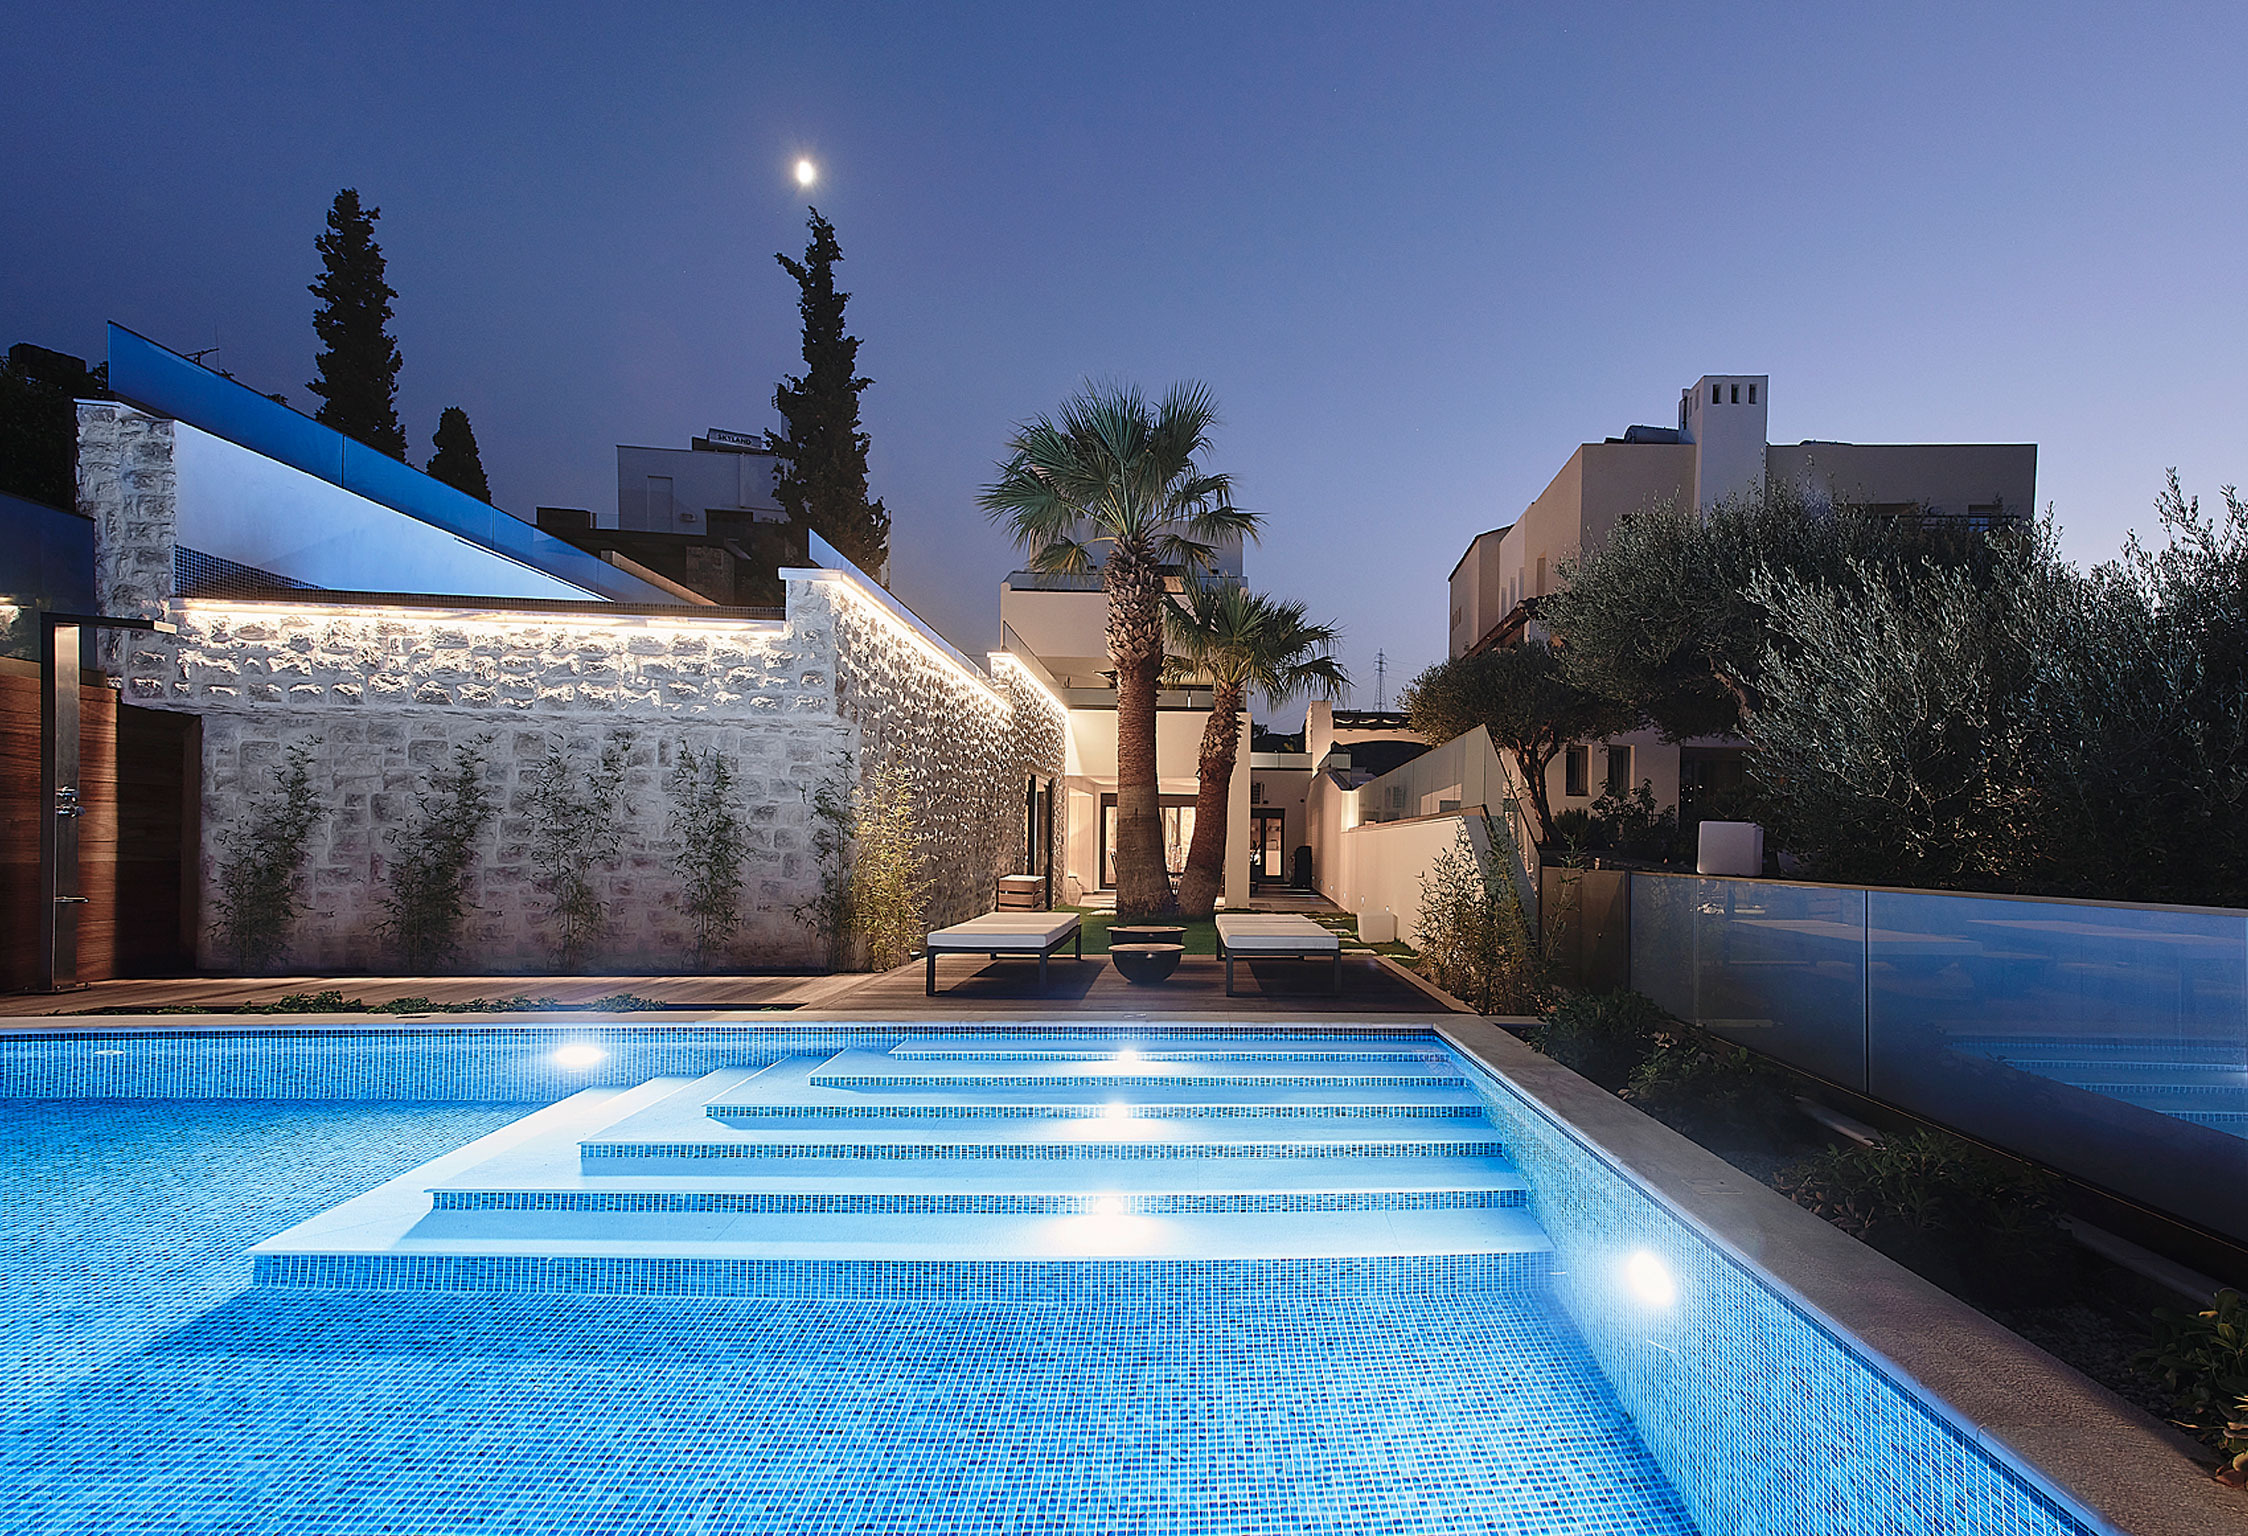 Crete Villa Naomi Sand jumbotron image